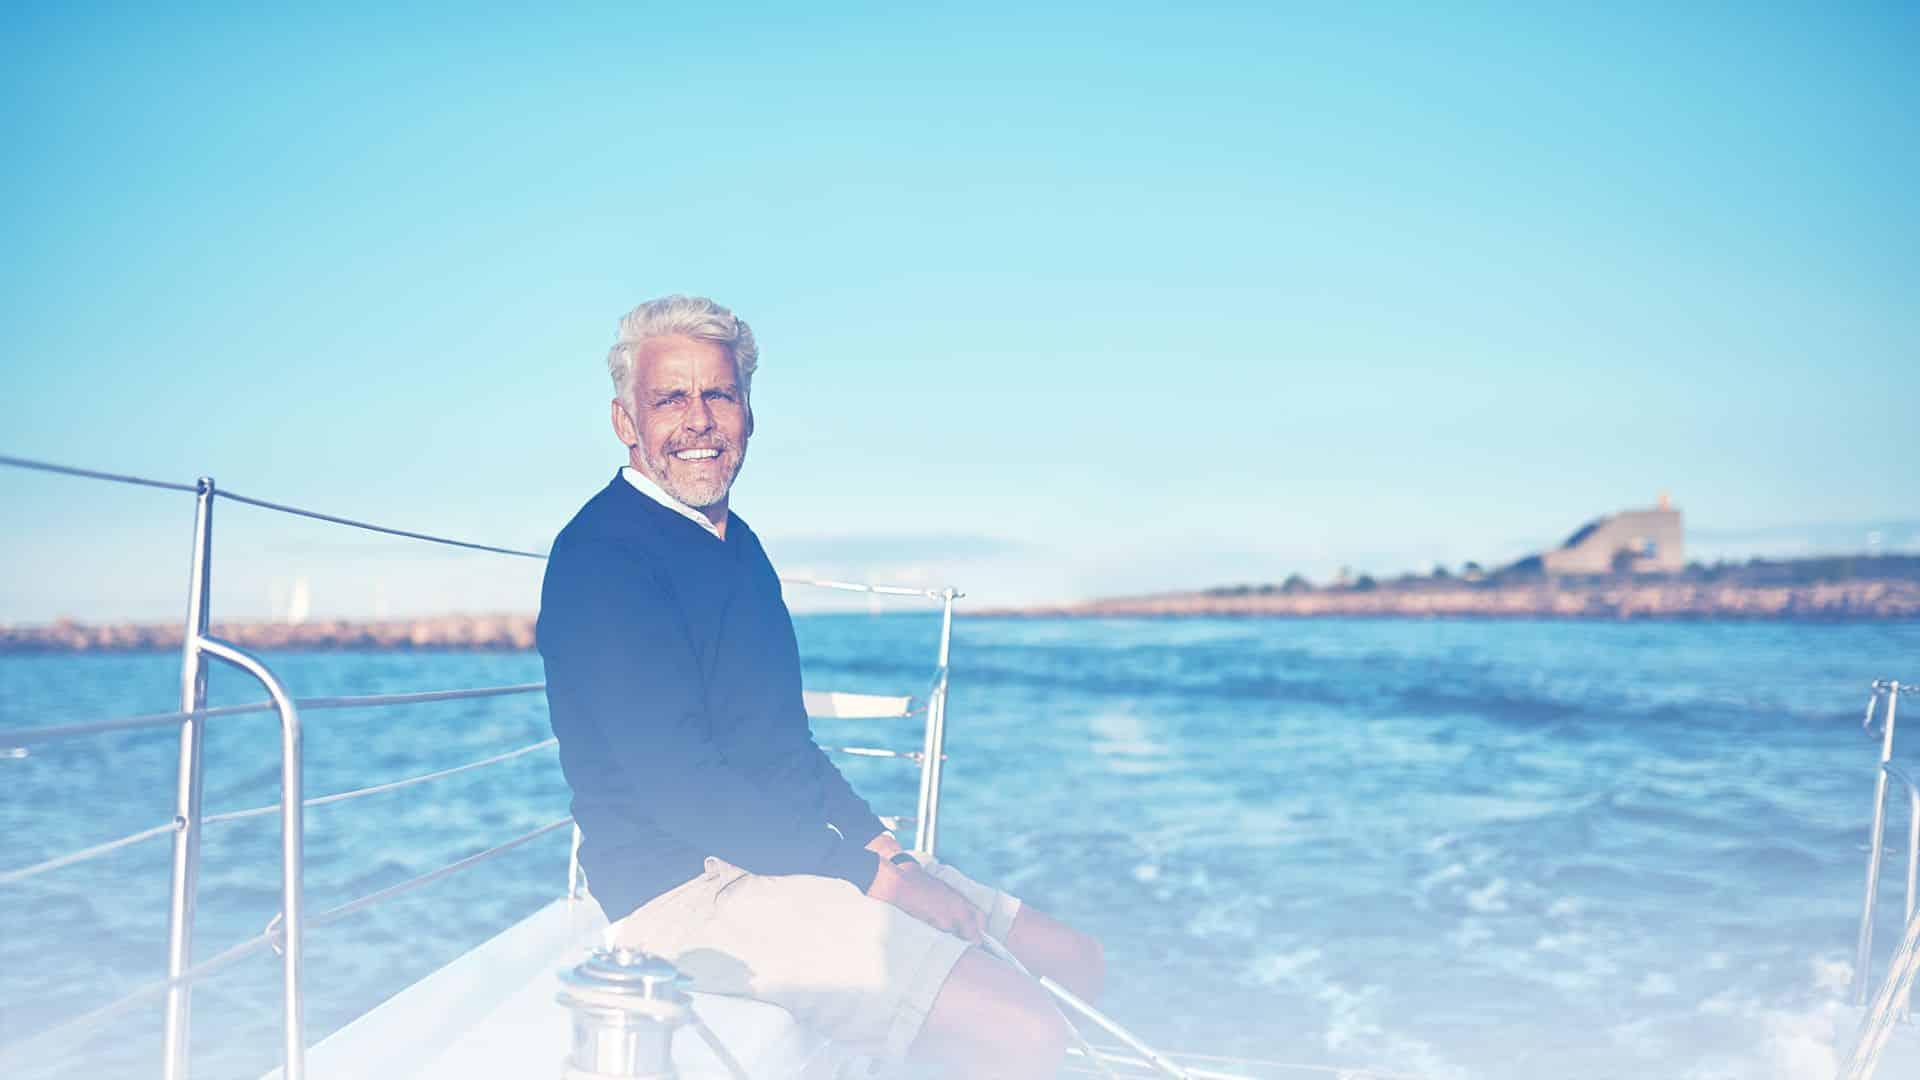 Gentleman enjoying his boat financed with My Financing USA